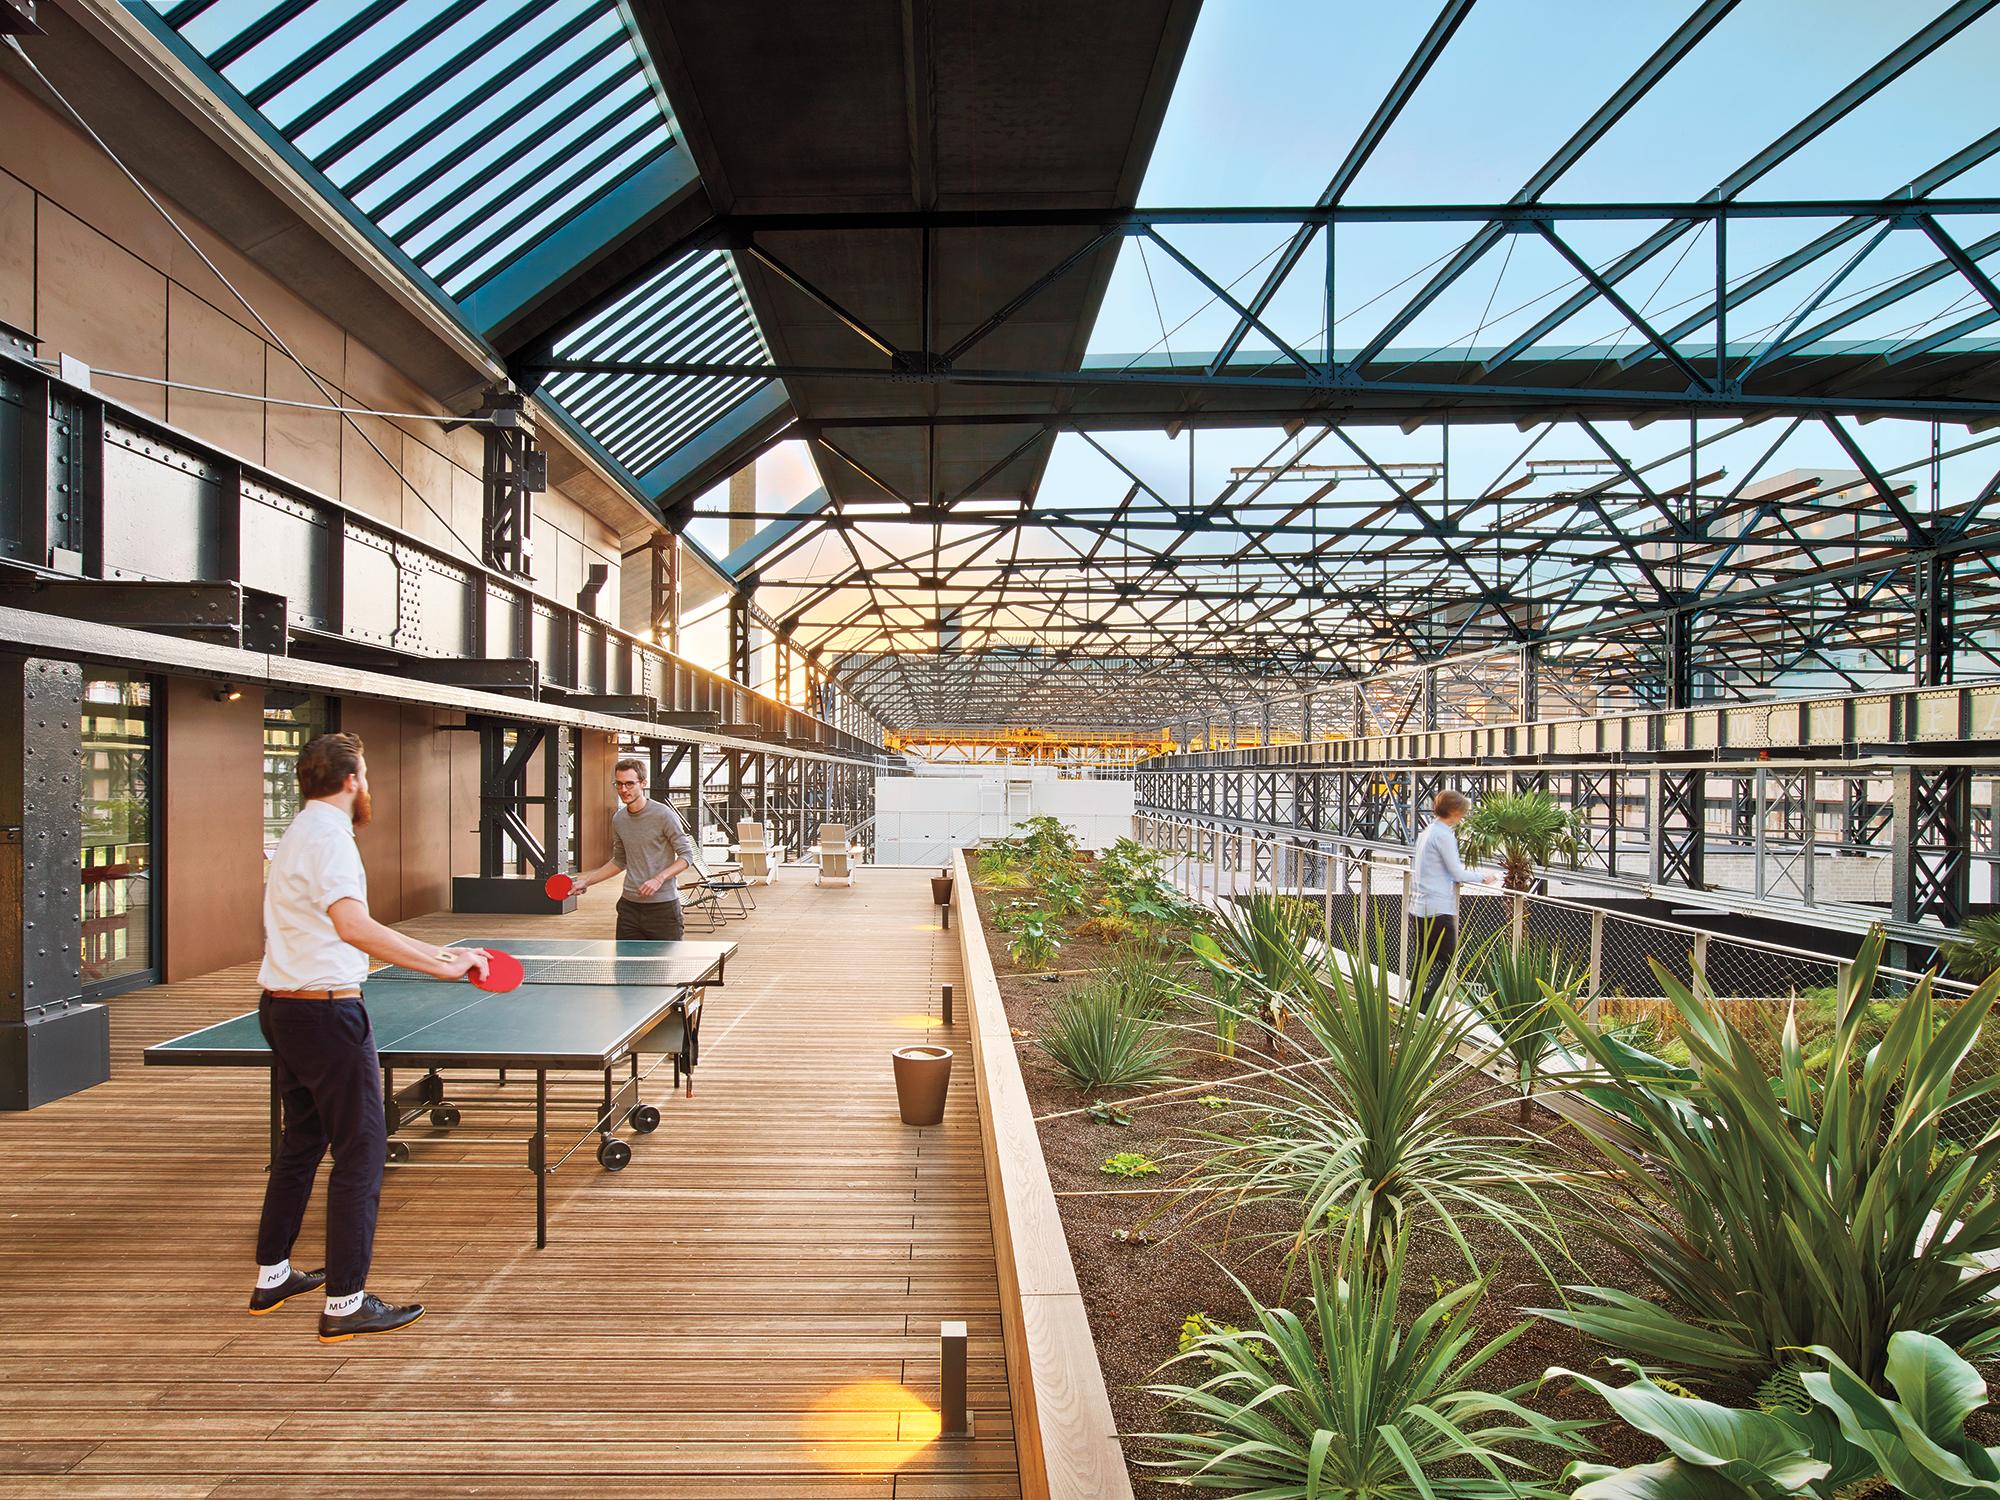 Saguez U0026 Partnersu0027 Office Is A Brazilian Inspired Oasis Outside Paris